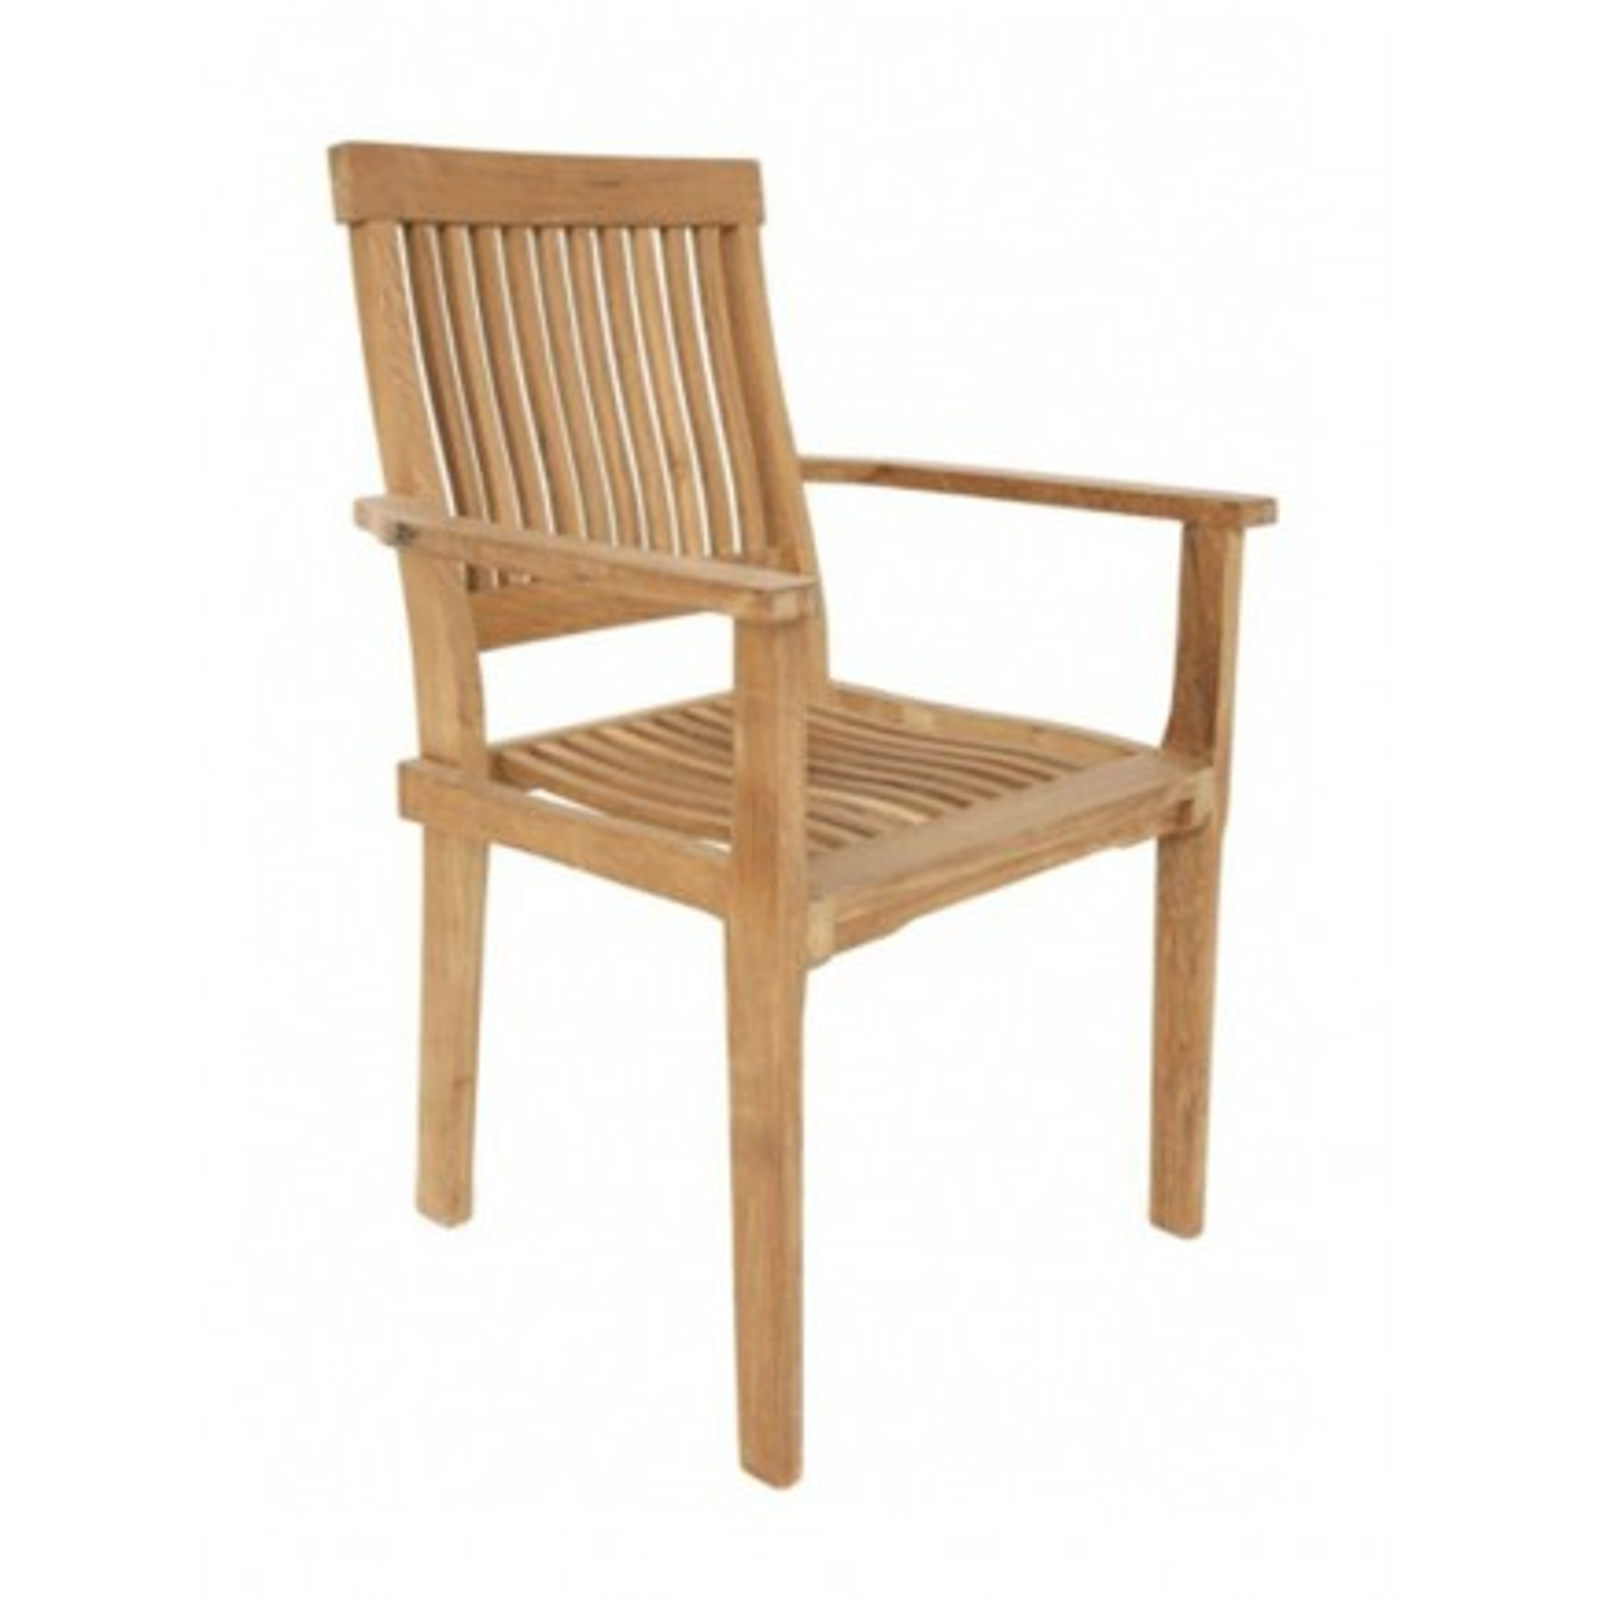 Fauteuil Empilable Taman Teck Recyclé - meuble de jardin